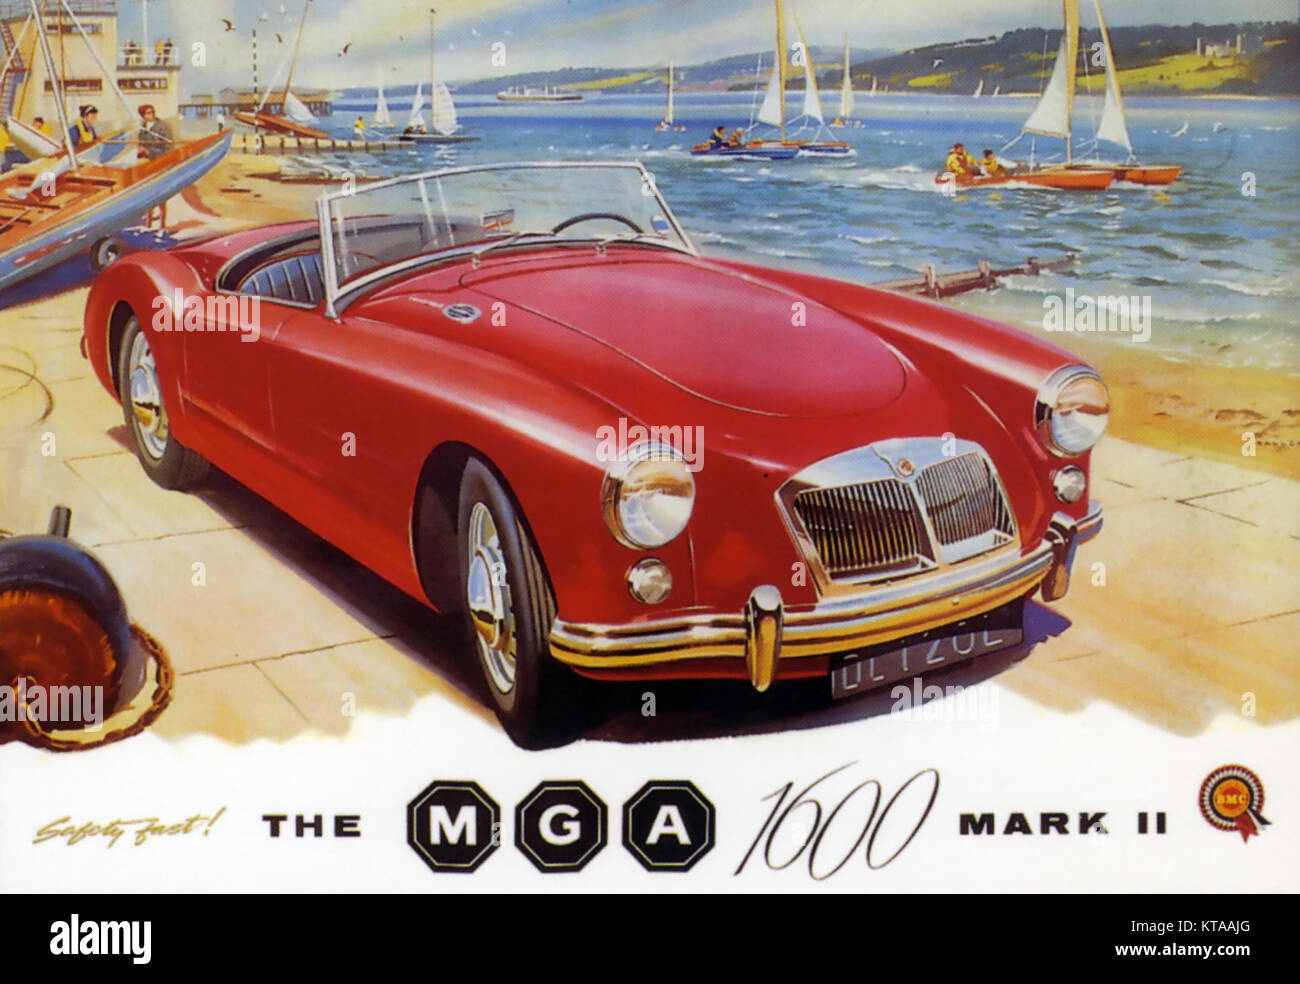 MGA 1600 Mk II Anzeige etwa 1960 Stockbild